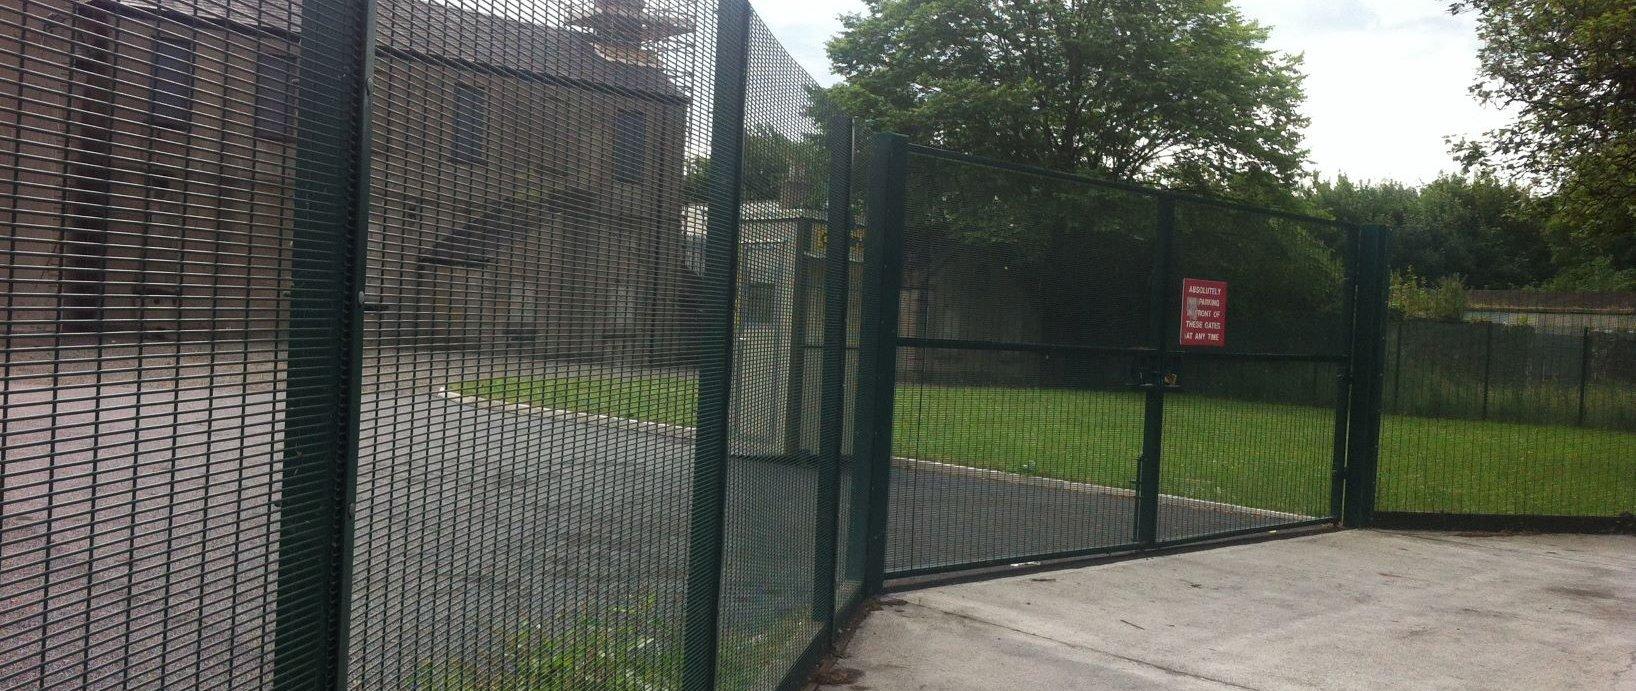 358 Weld Mesh Fence